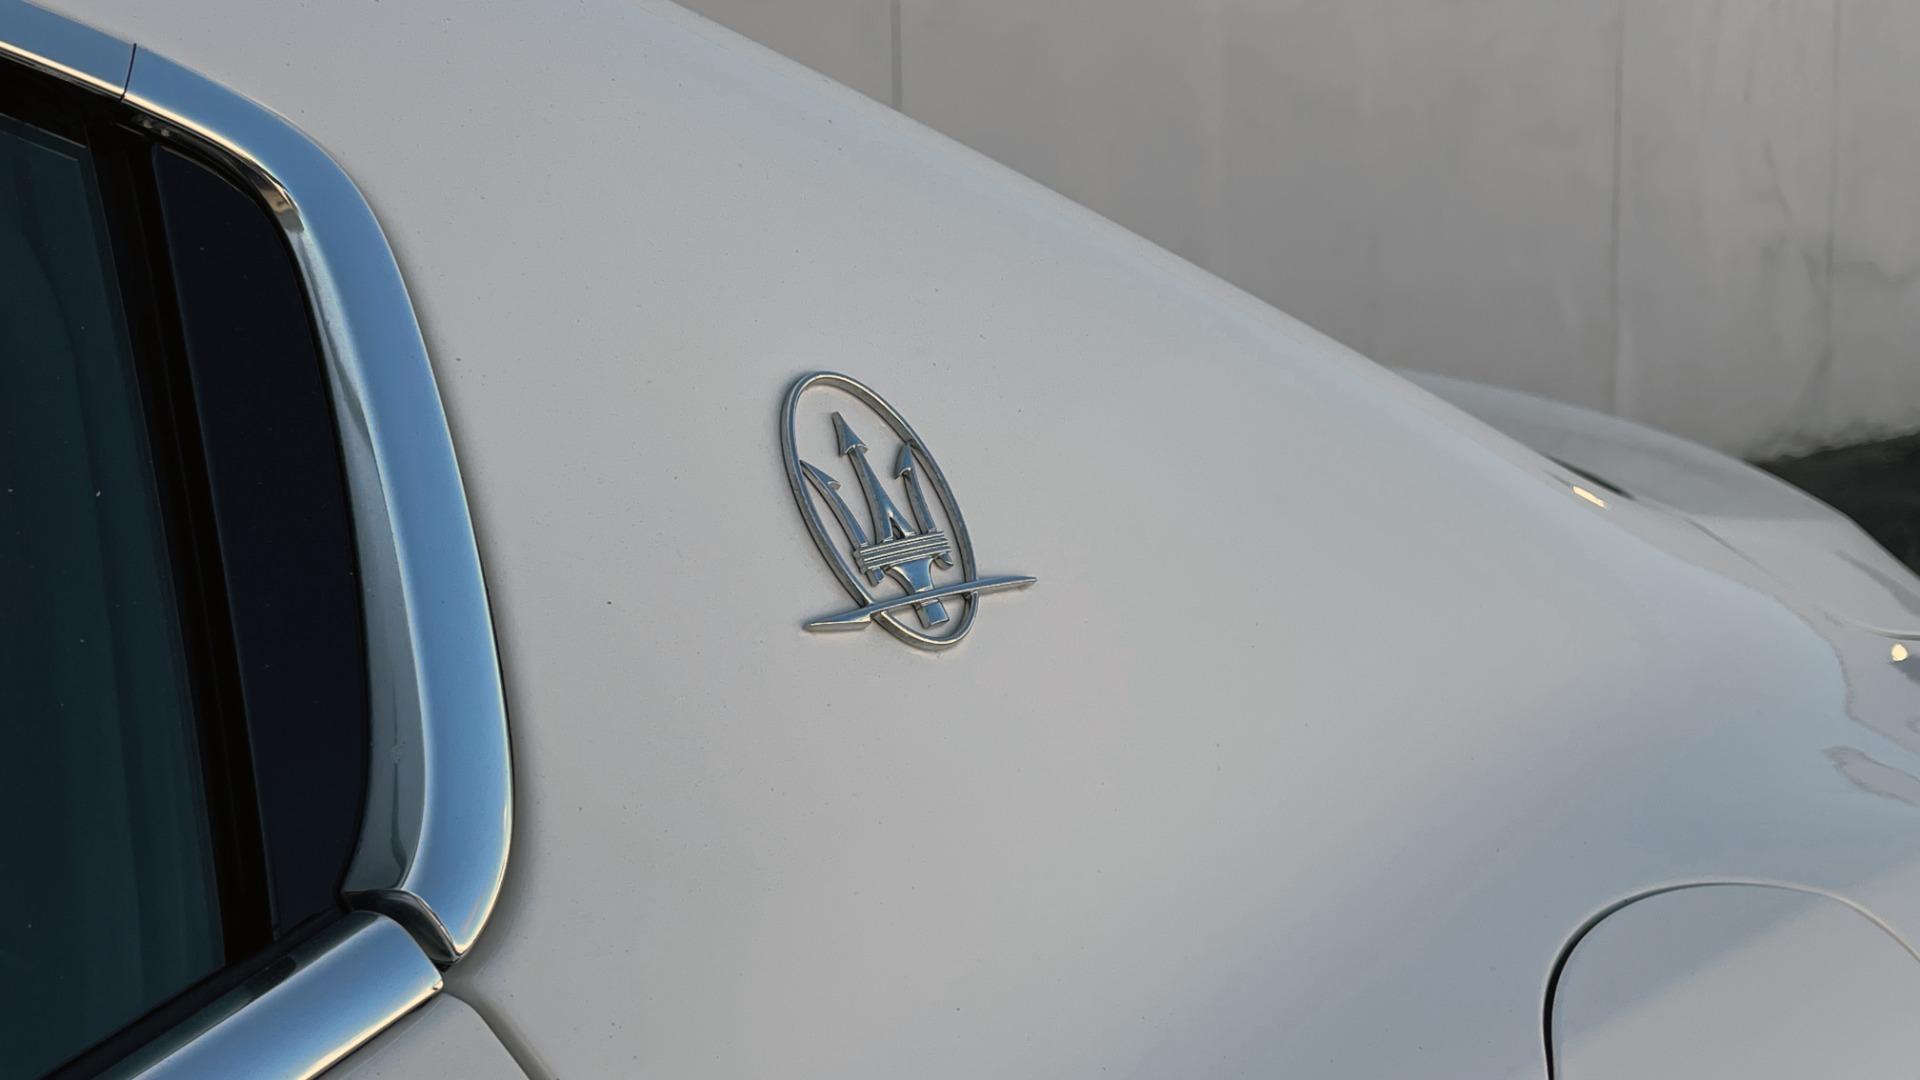 Used 2018 Maserati GHIBLI SEDAN / RWD / 3.0L V6 / SUNROOF / NAV / REARVIEW for sale $42,995 at Formula Imports in Charlotte NC 28227 11